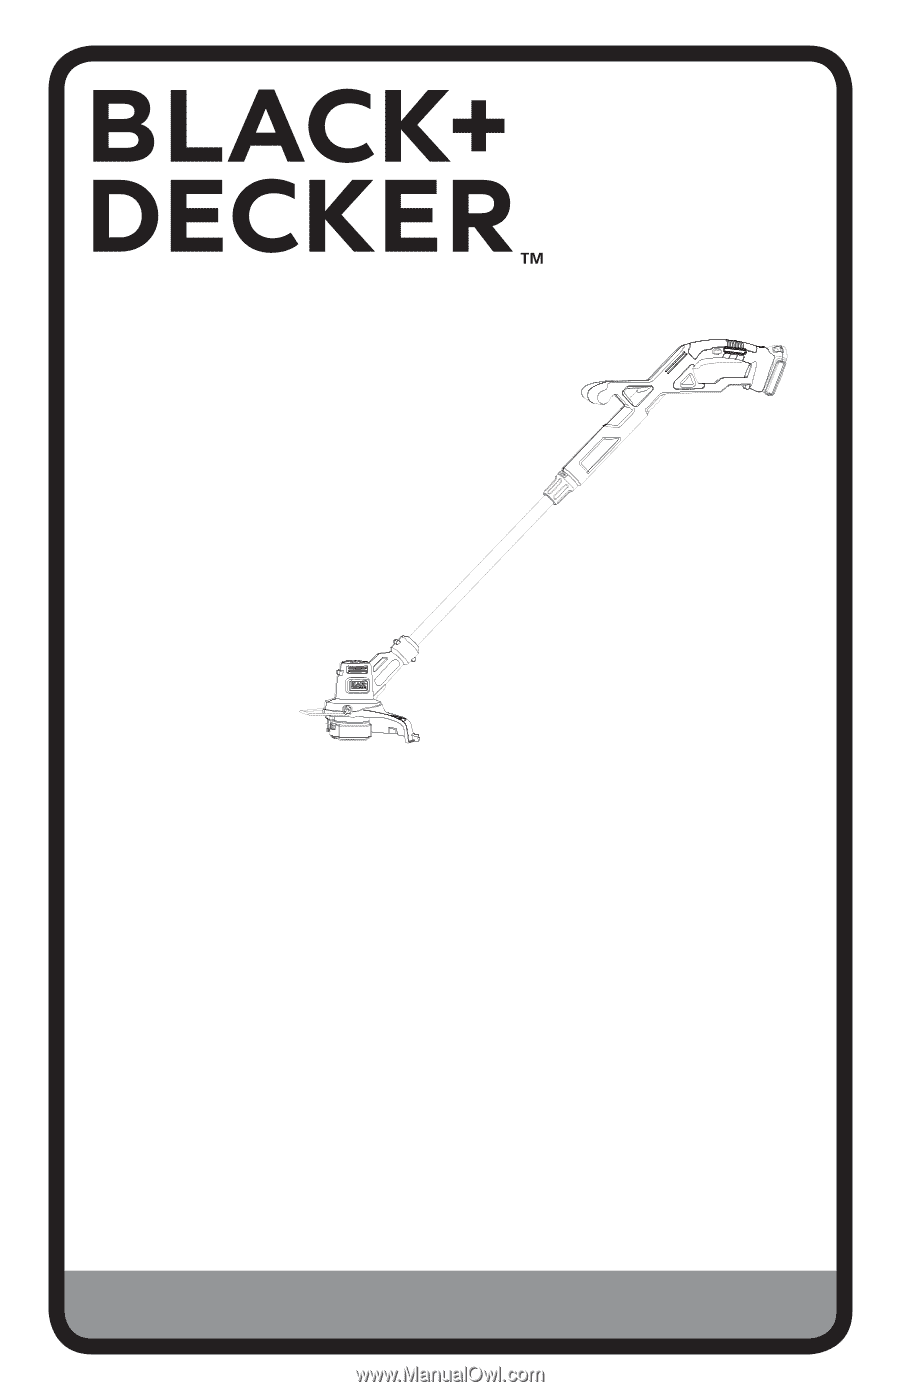 Black Decker Lst201 Instruction Manual Page 1